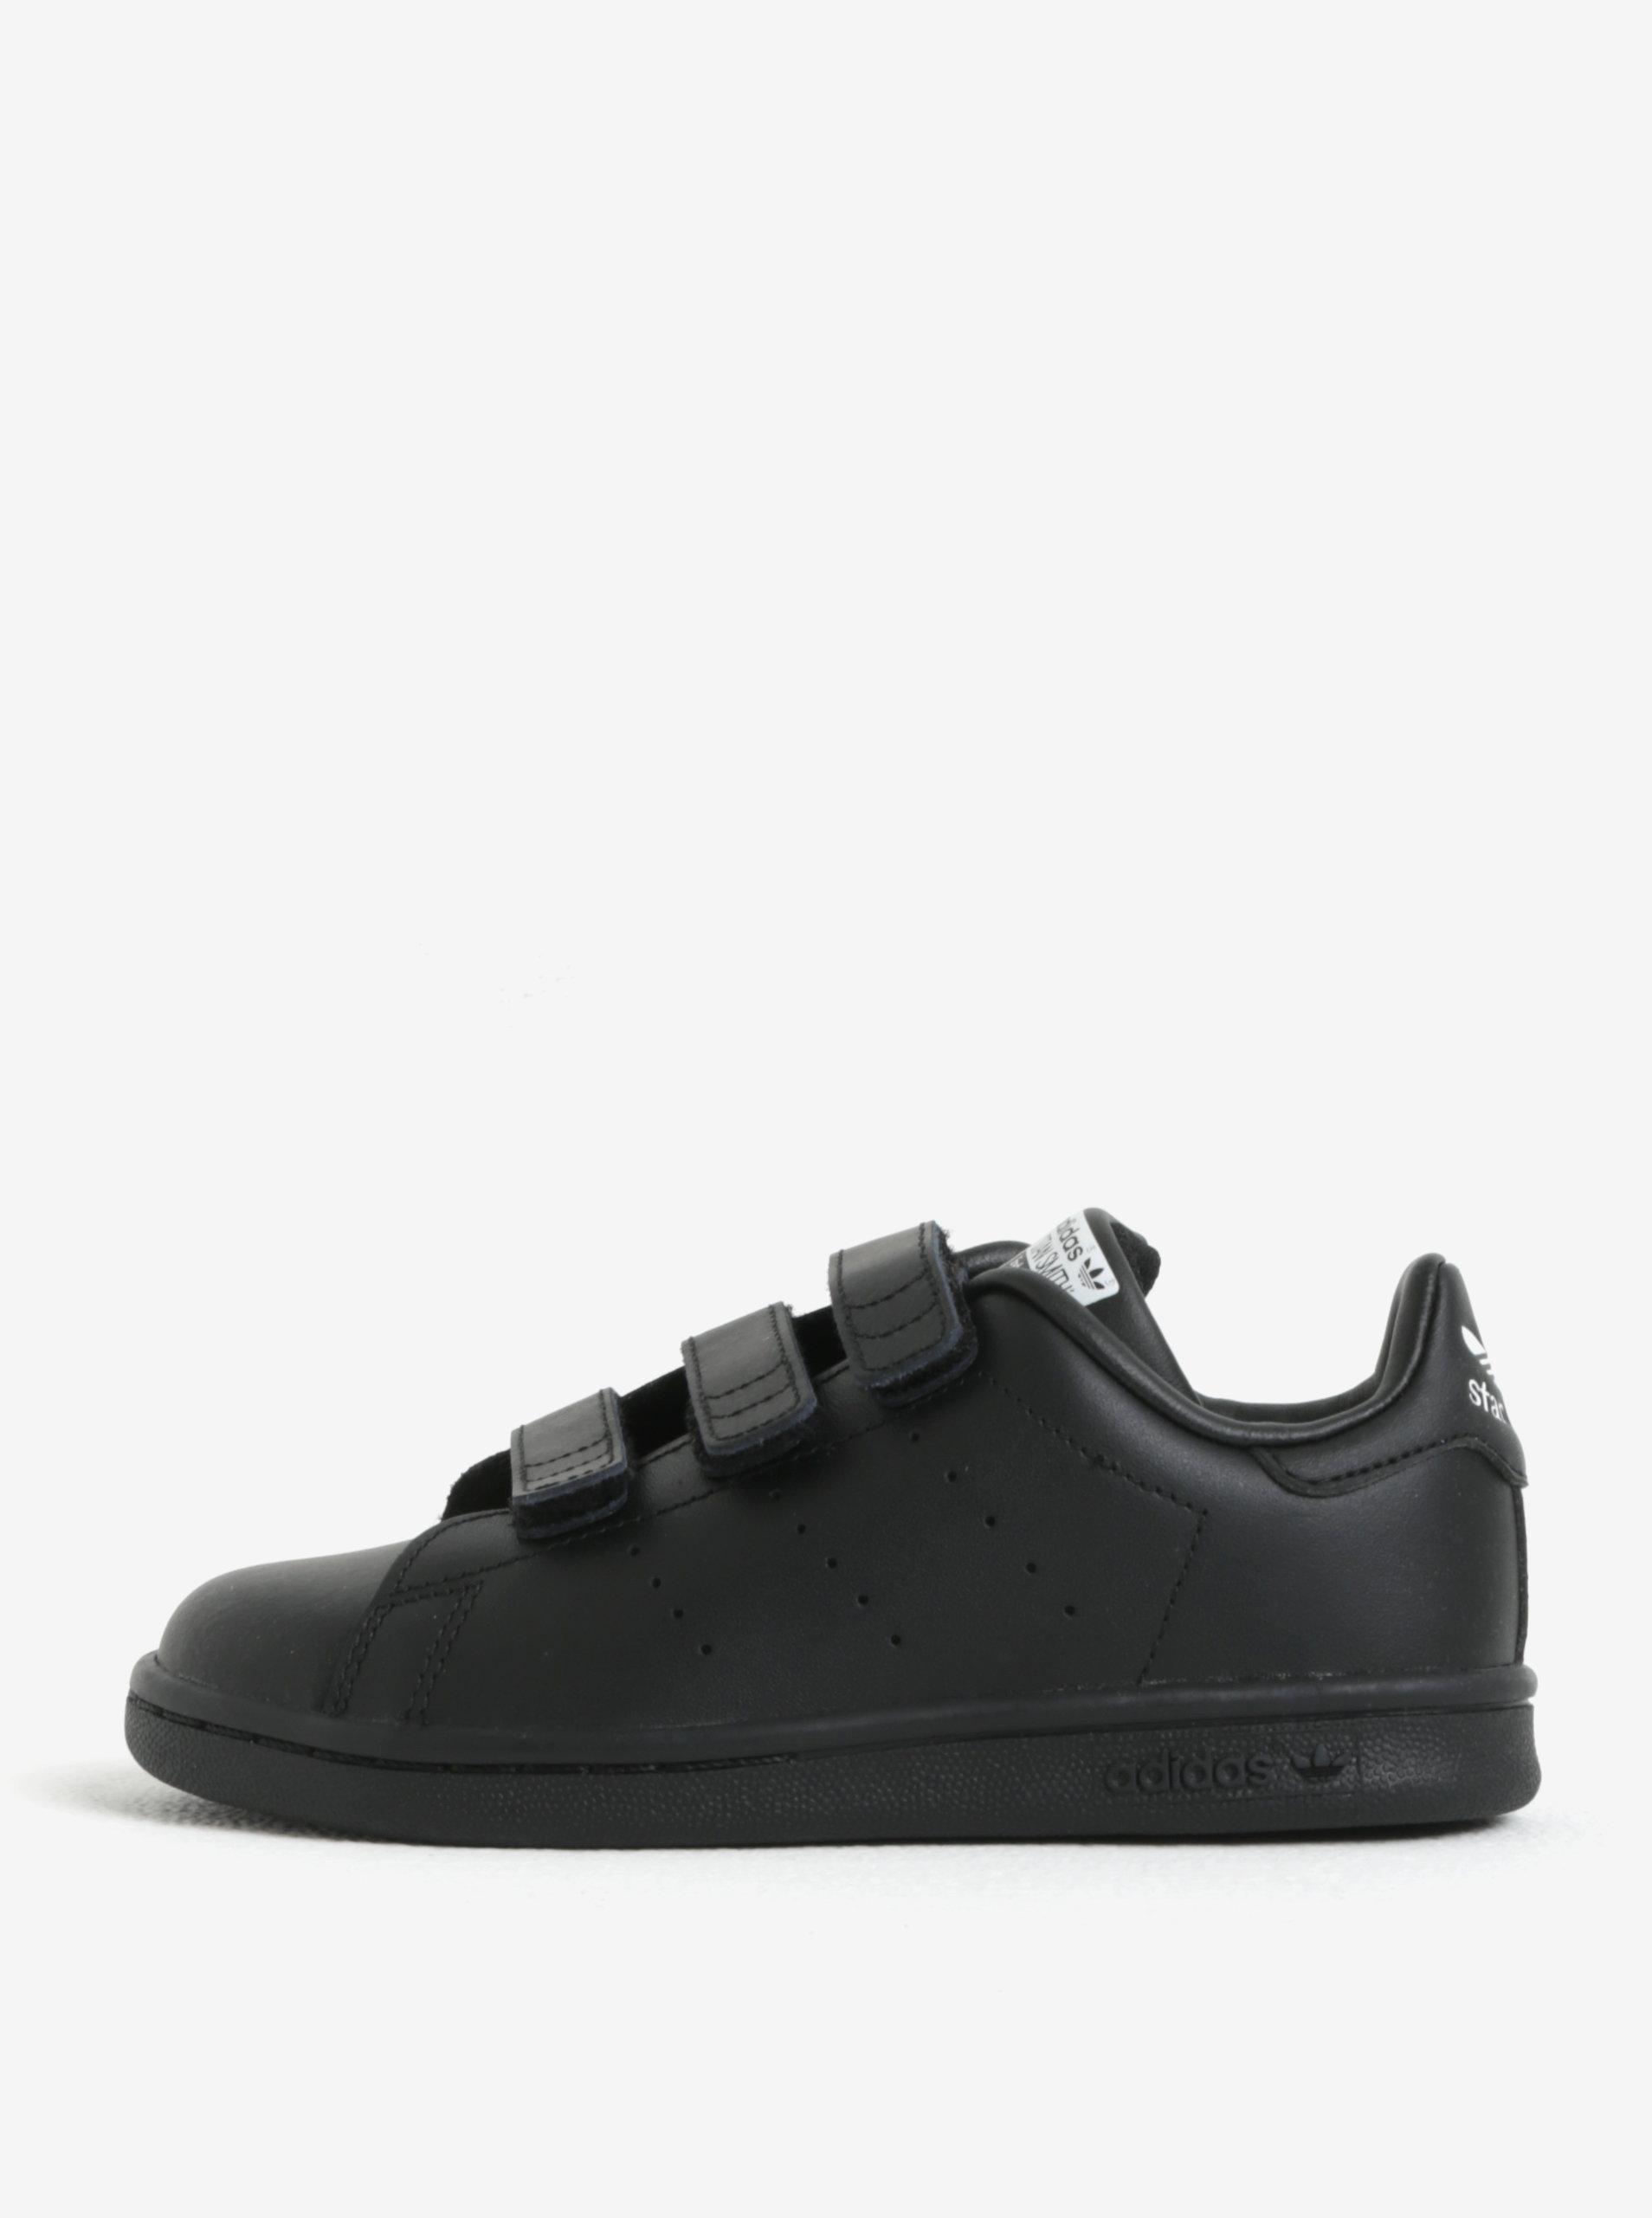 587a8013fe7 Čierne detské kožené tenisky na suchý zips adidas Originals ...